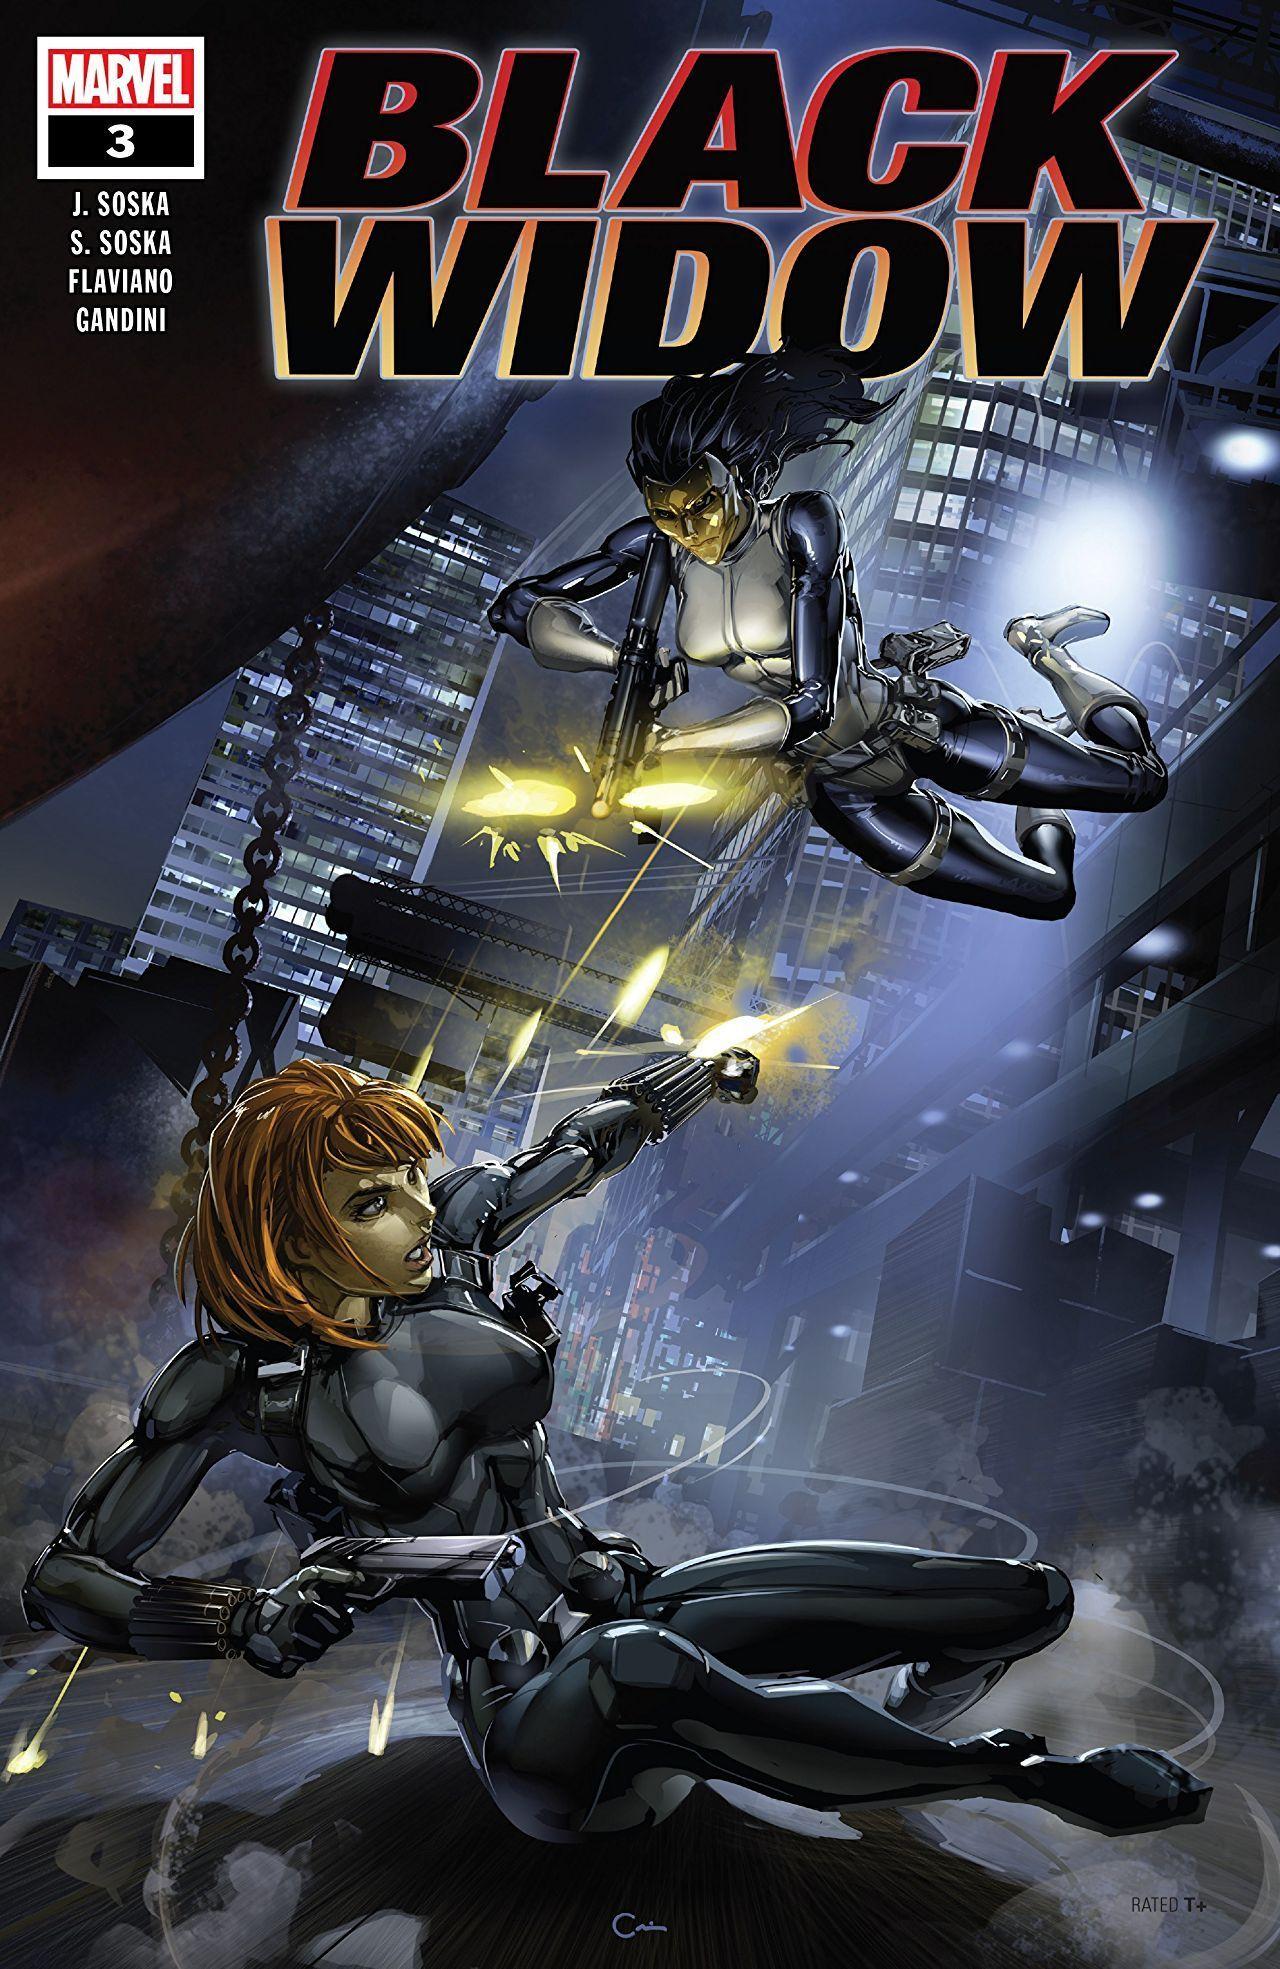 black-widow-3-cover